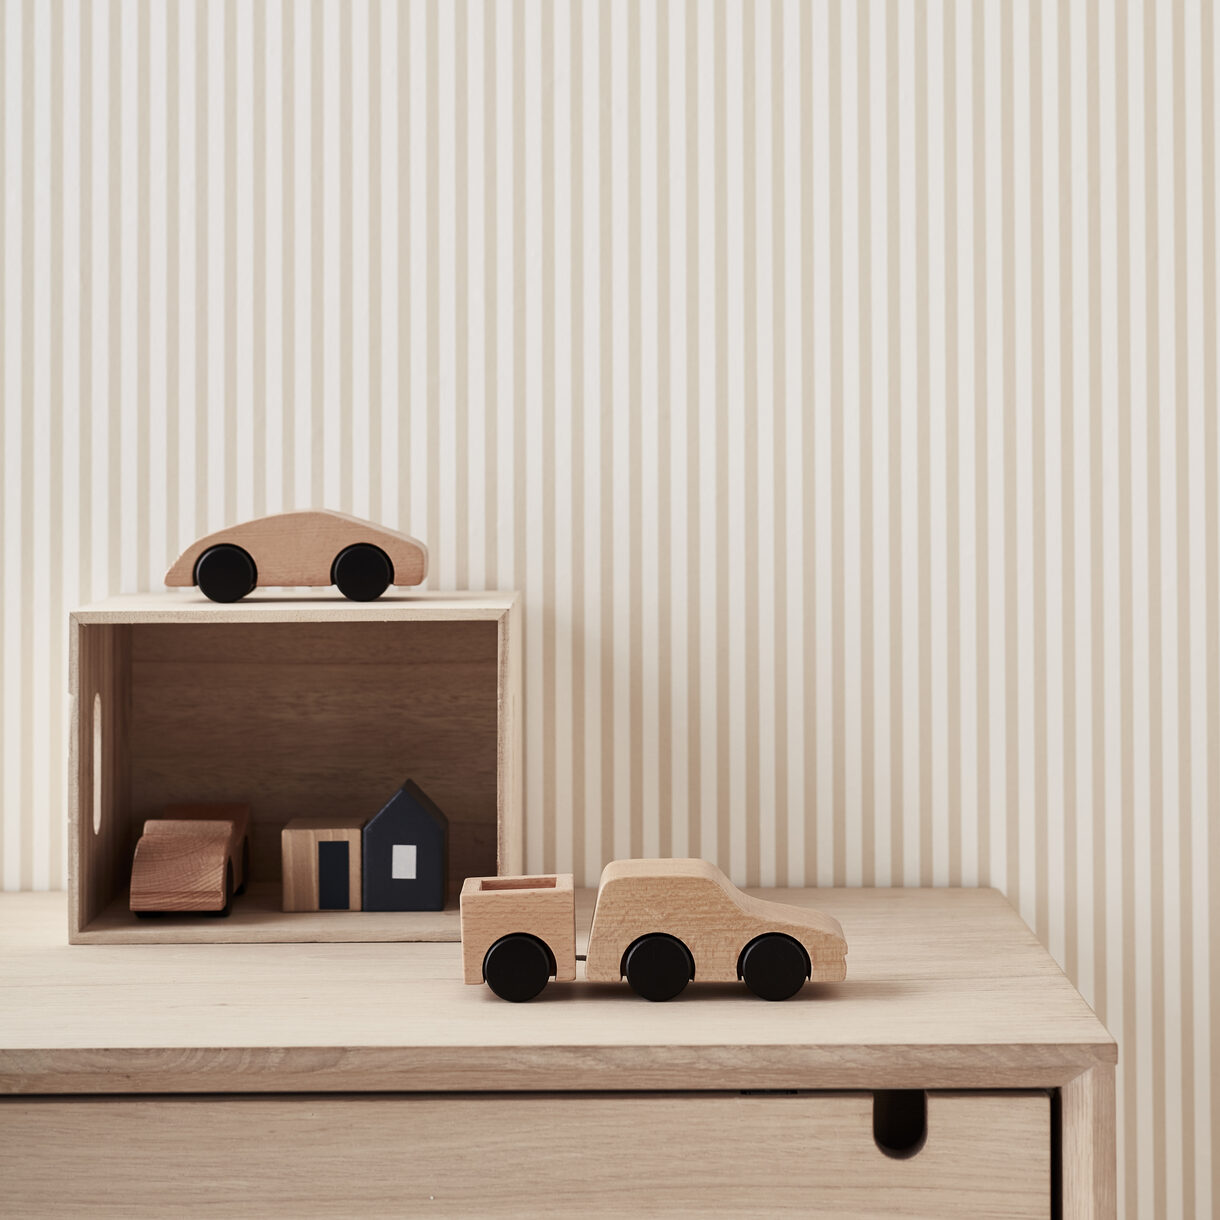 kids concept //木製おもちゃのスポーツカー(wood)